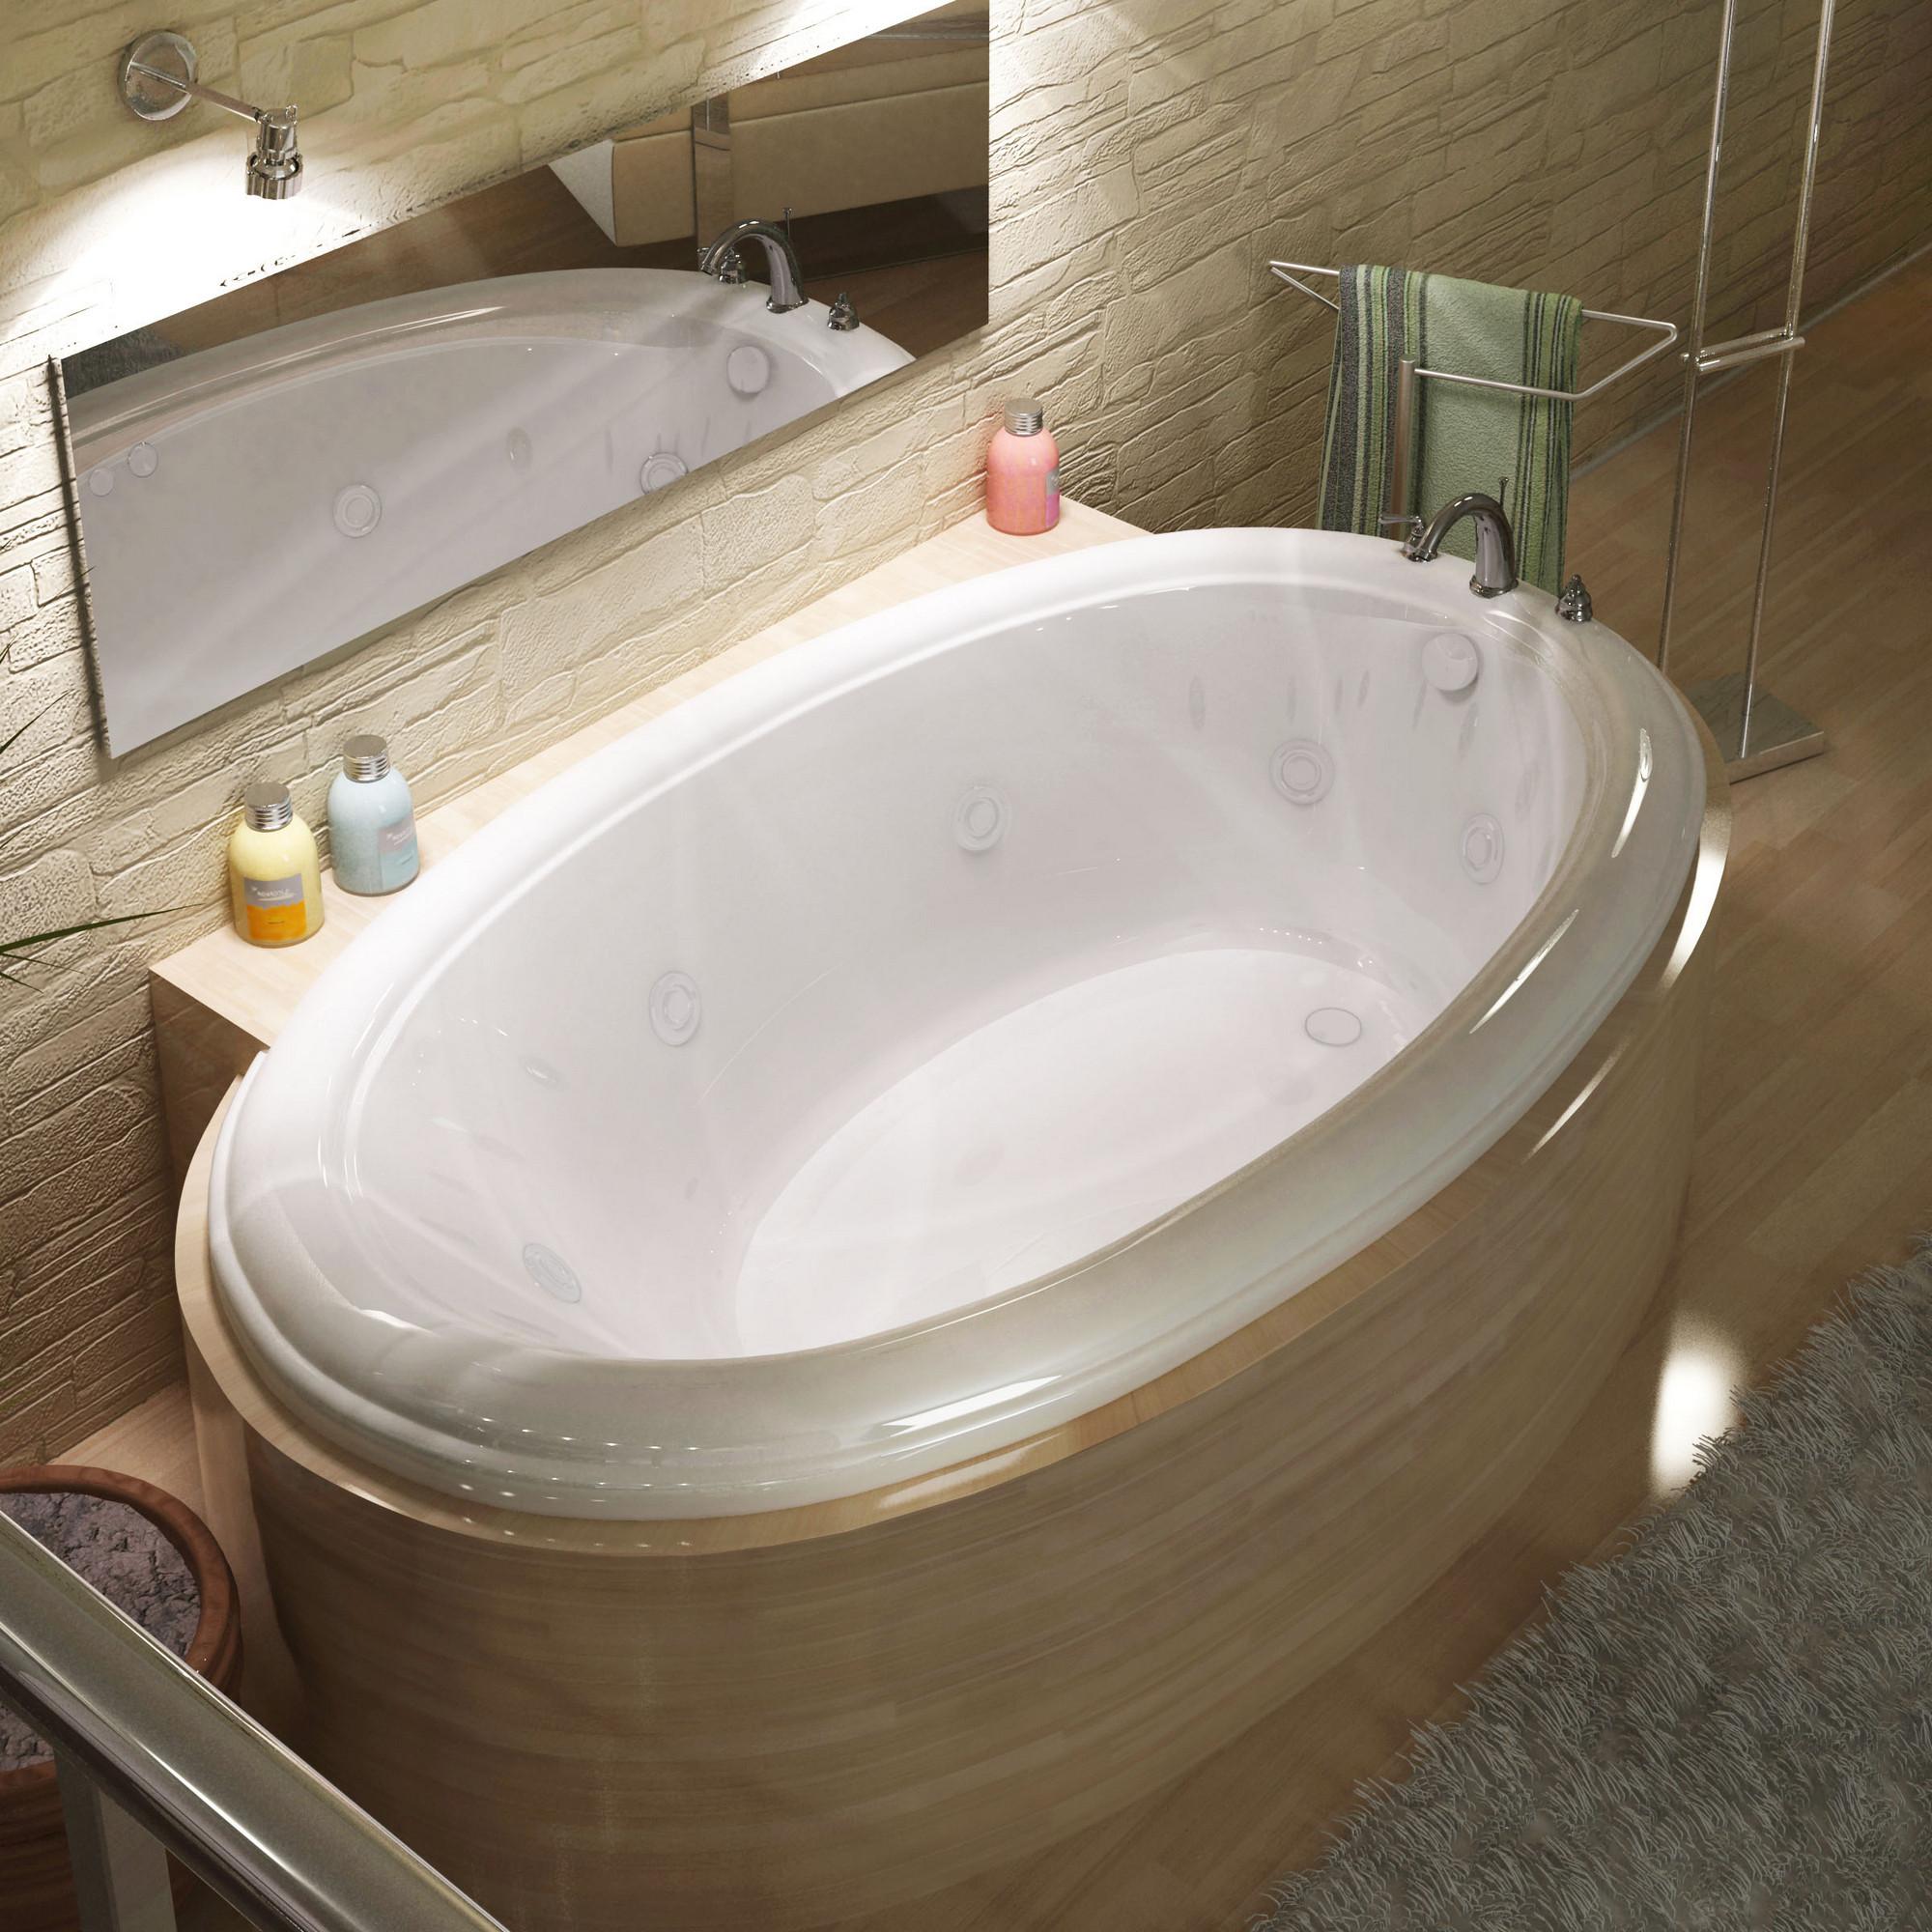 MediTub 4478PCWR Atlantis Petite Oval Whirlpool Bathtub With Right Pump